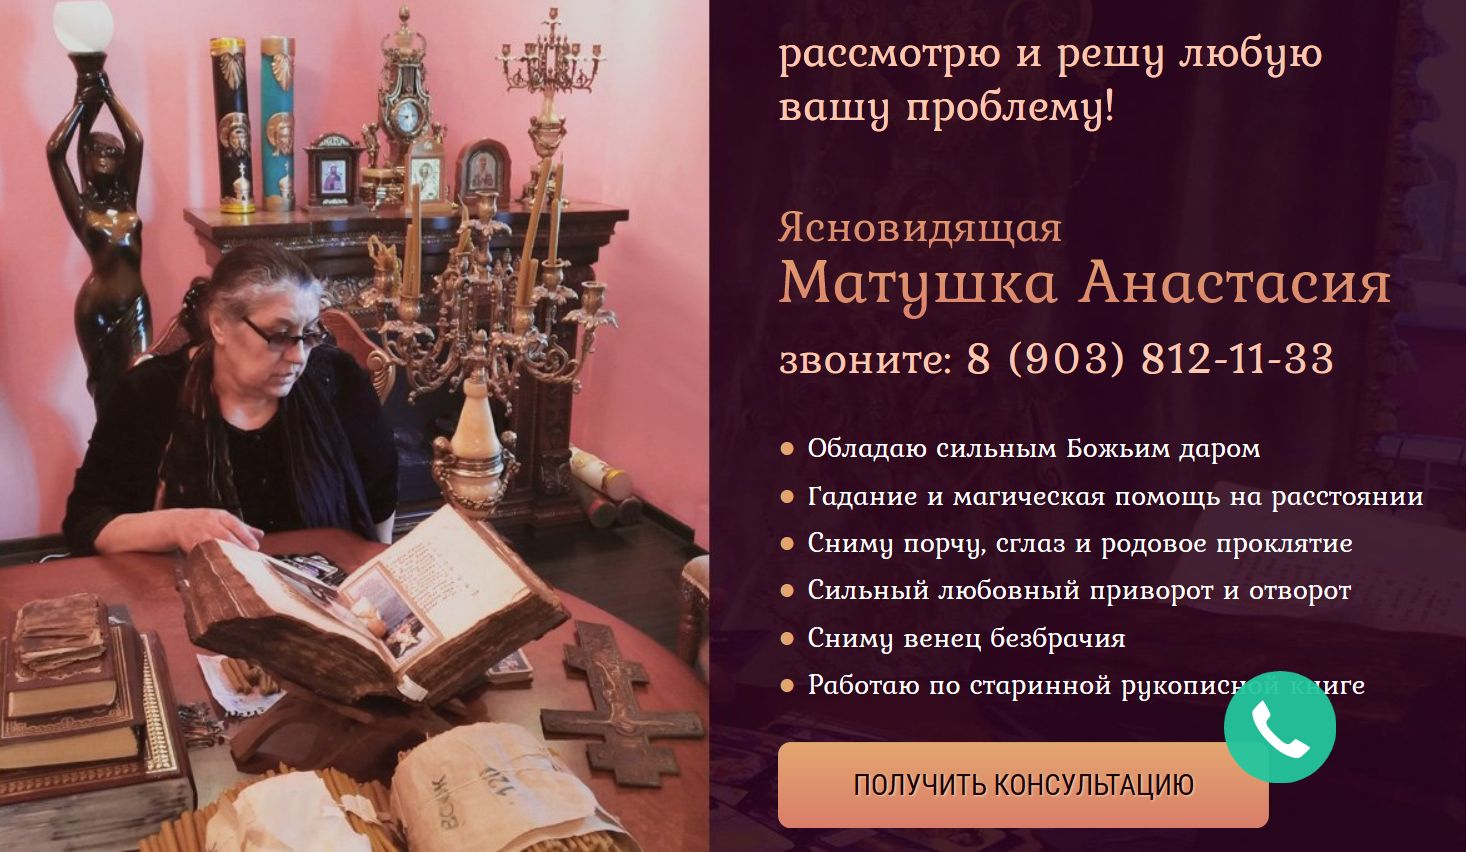 Ясновидящая Матушка Анастасия